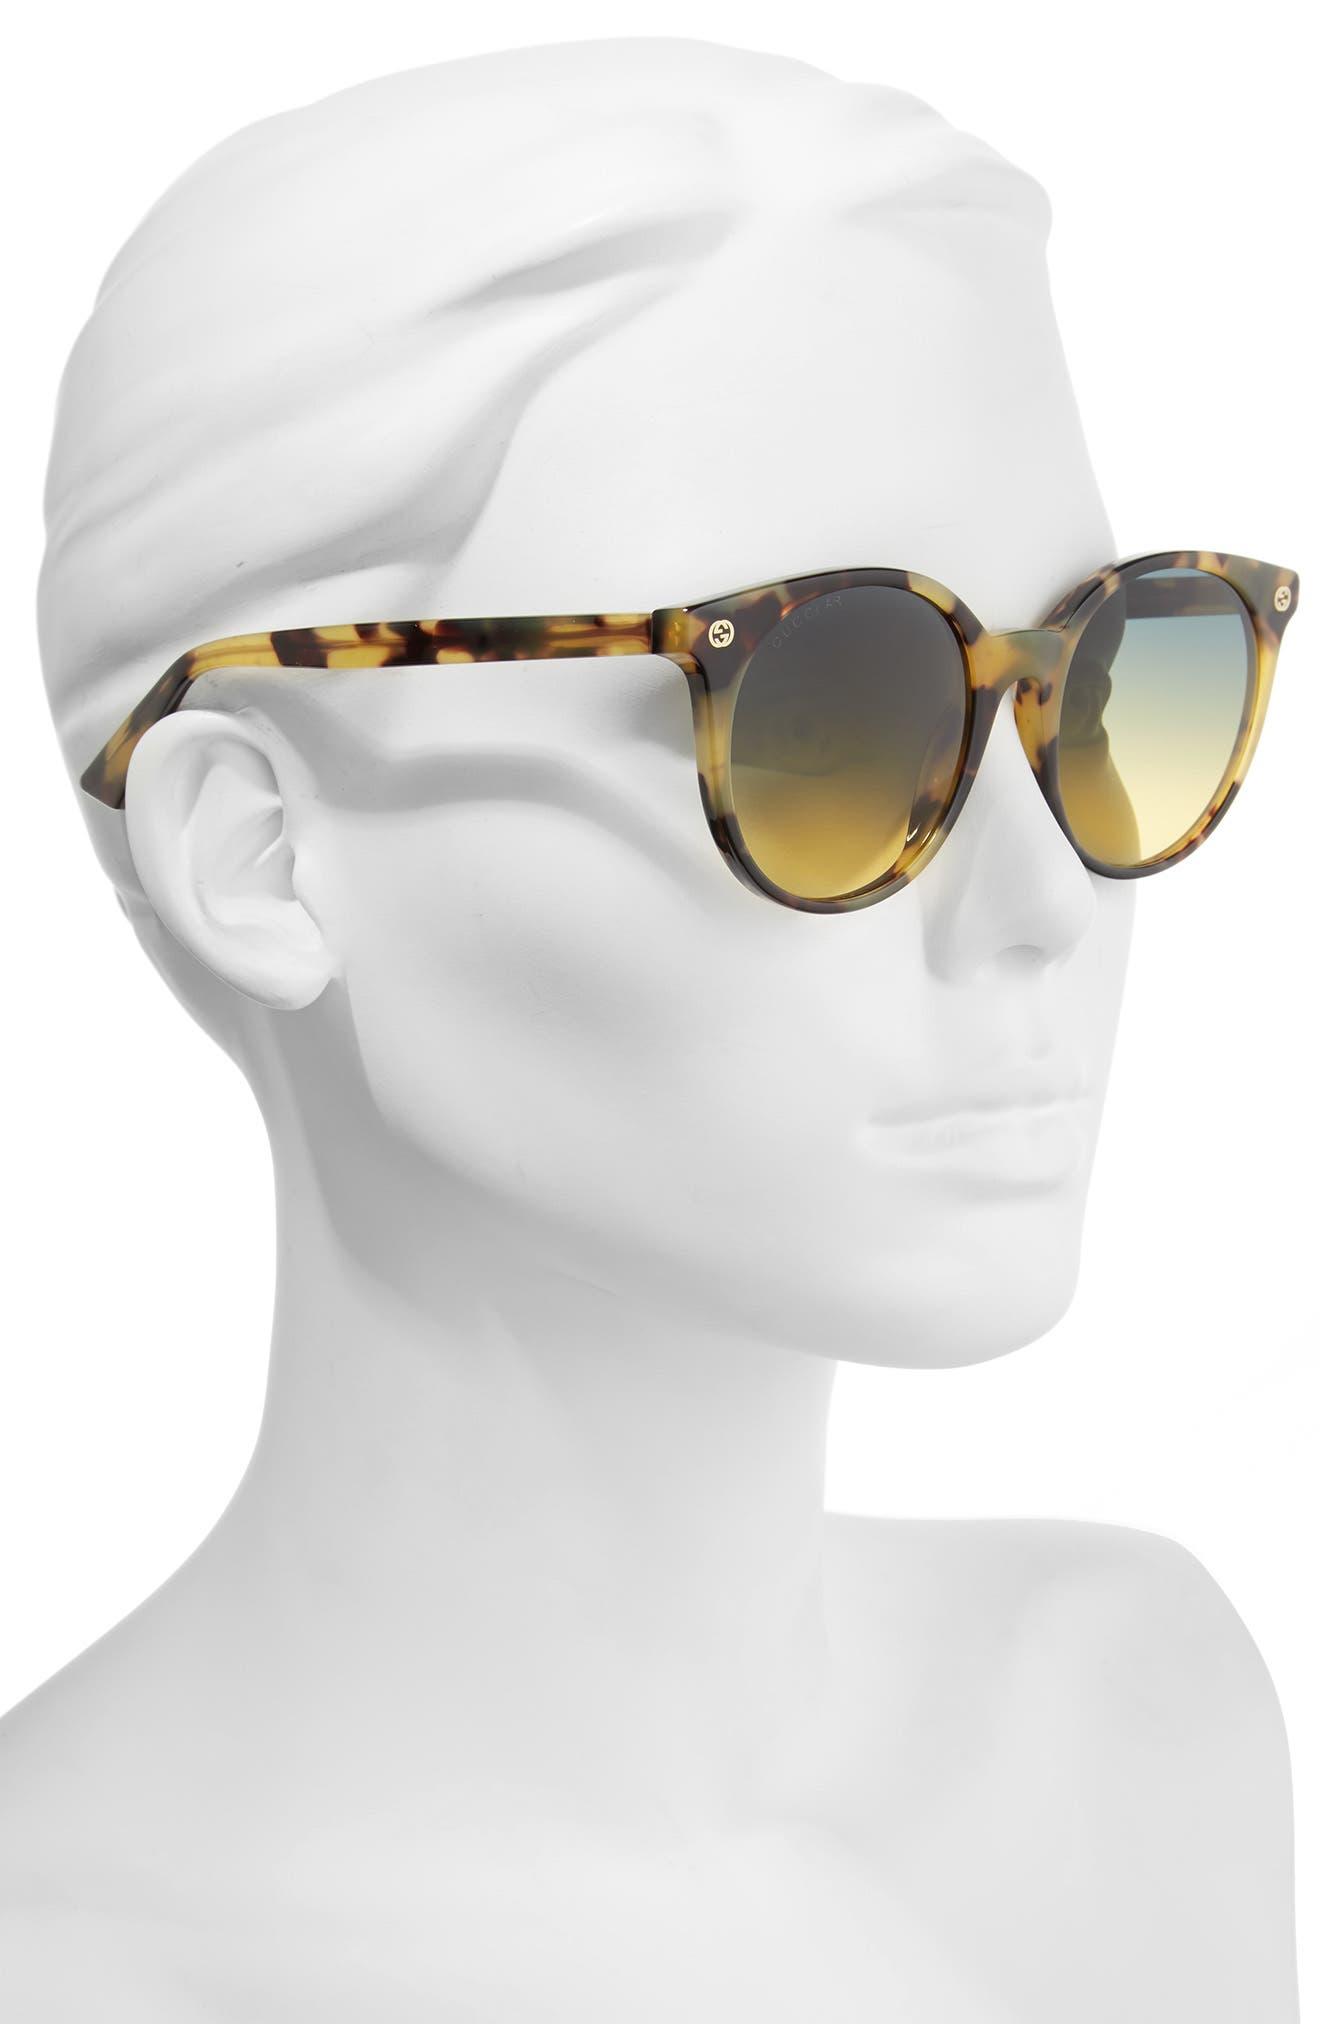 52mm Round Sunglasses,                             Alternate thumbnail 8, color,